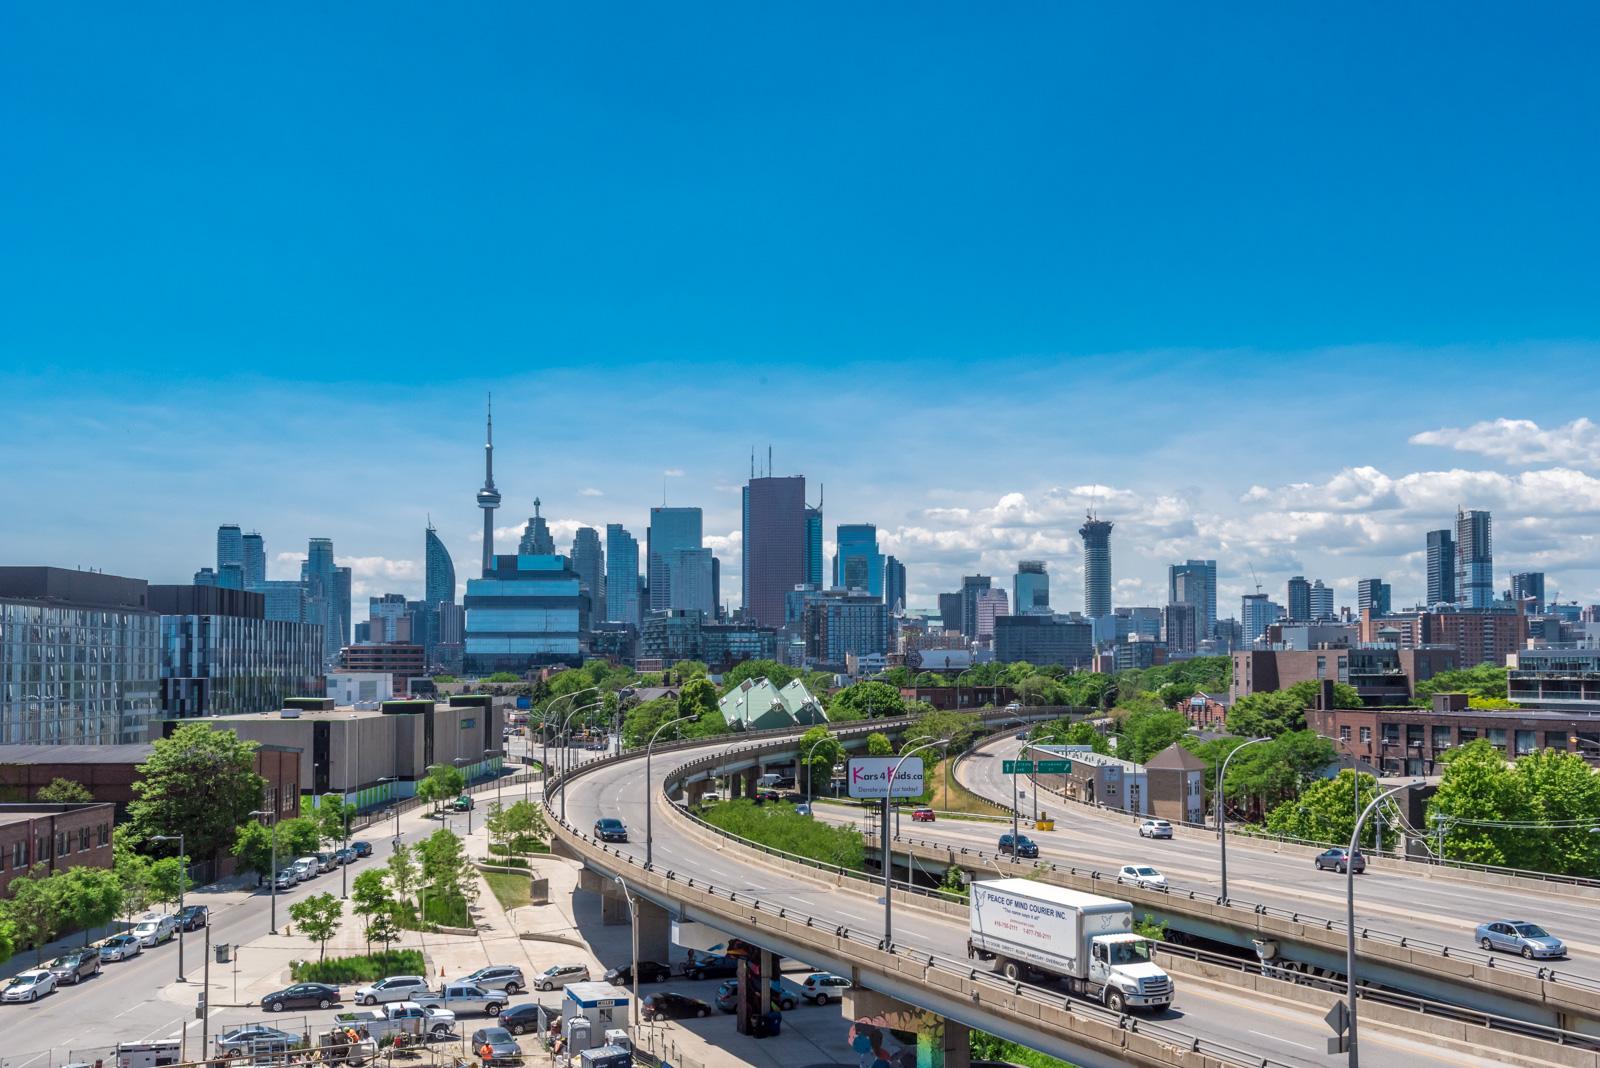 Finally, we have a photo of the Toronto skyline.